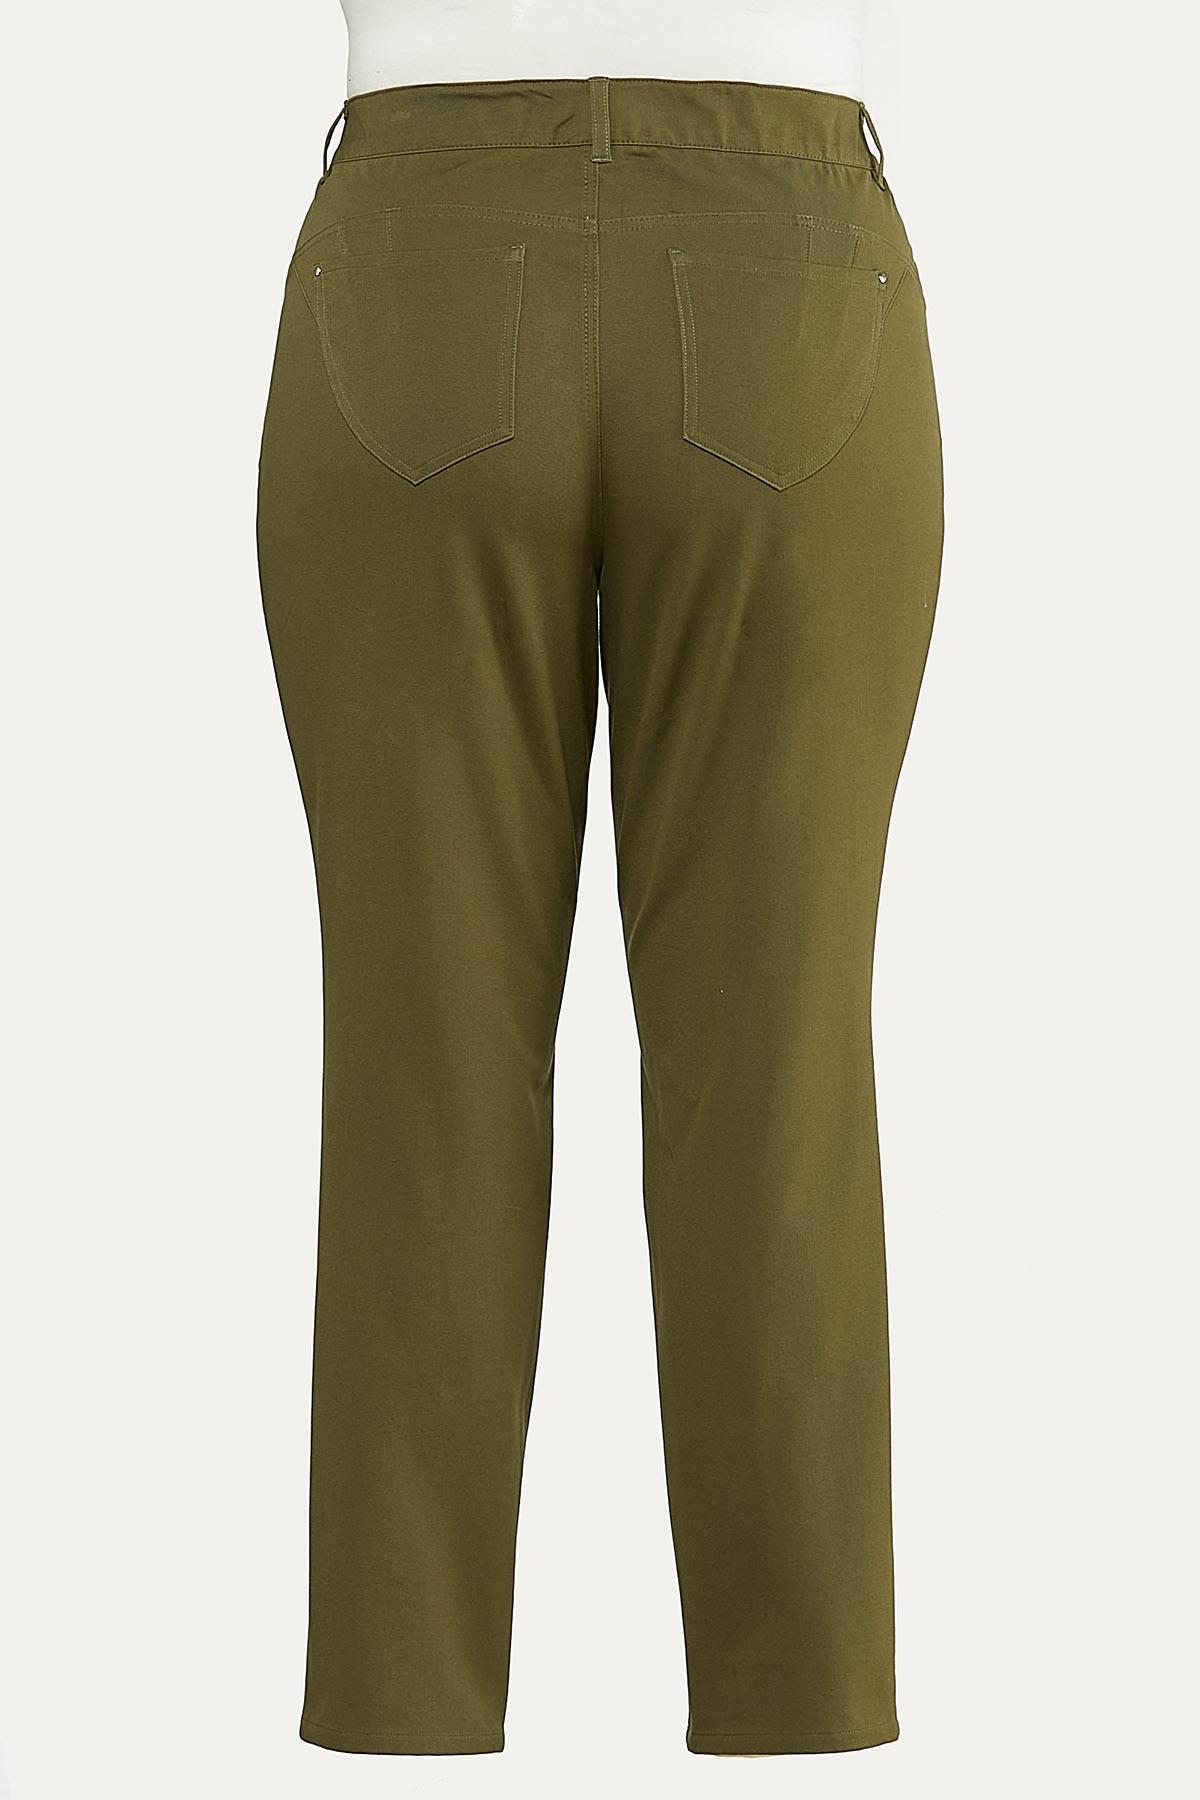 Plus Petite Curvy Getaway Pants (Item #44658729)